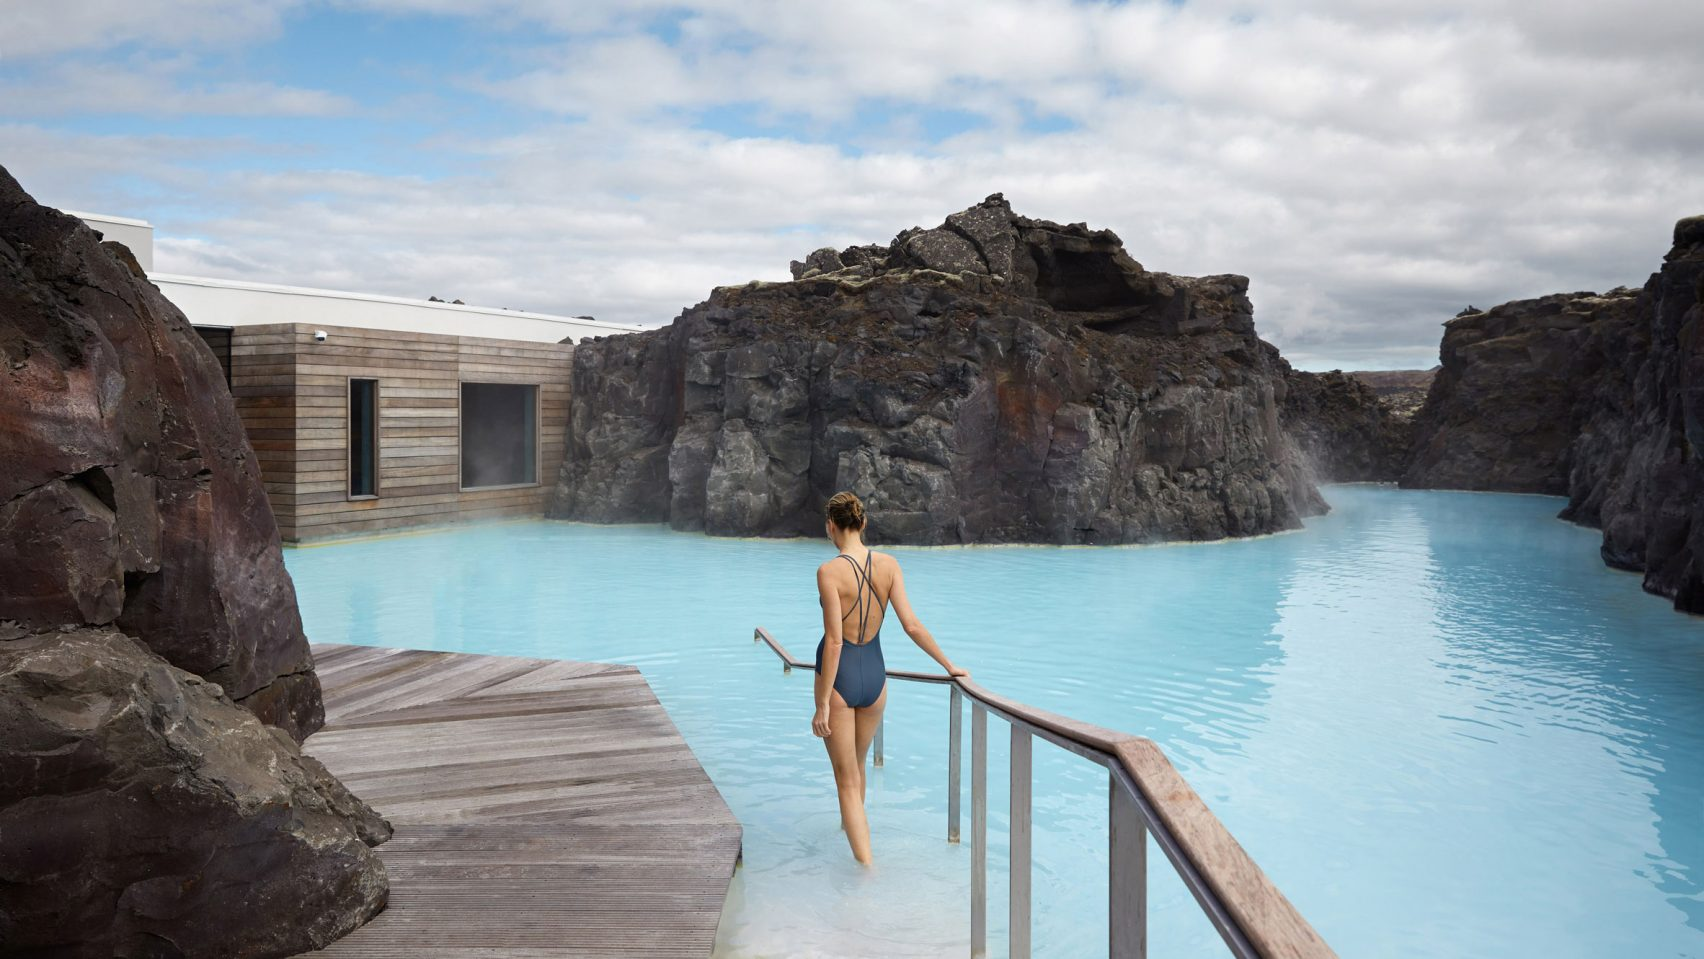 B&B-Italia-Blue-Lagoon-Hotel-Iceland-1.jpg